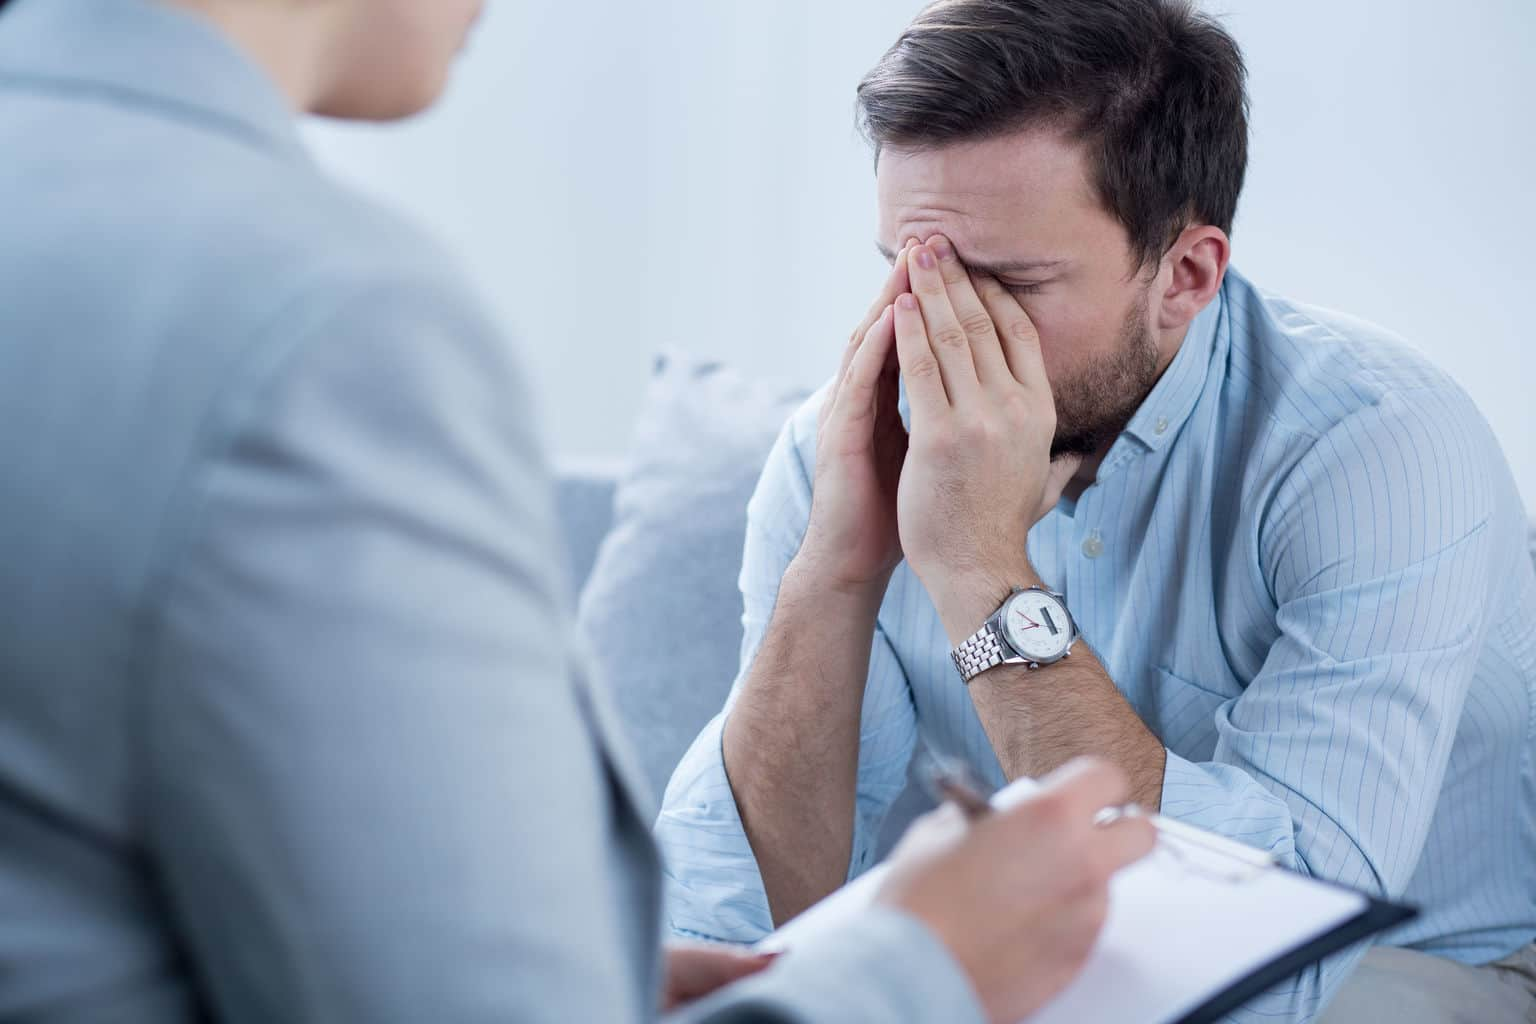 Fix penile fibrosis using these methods